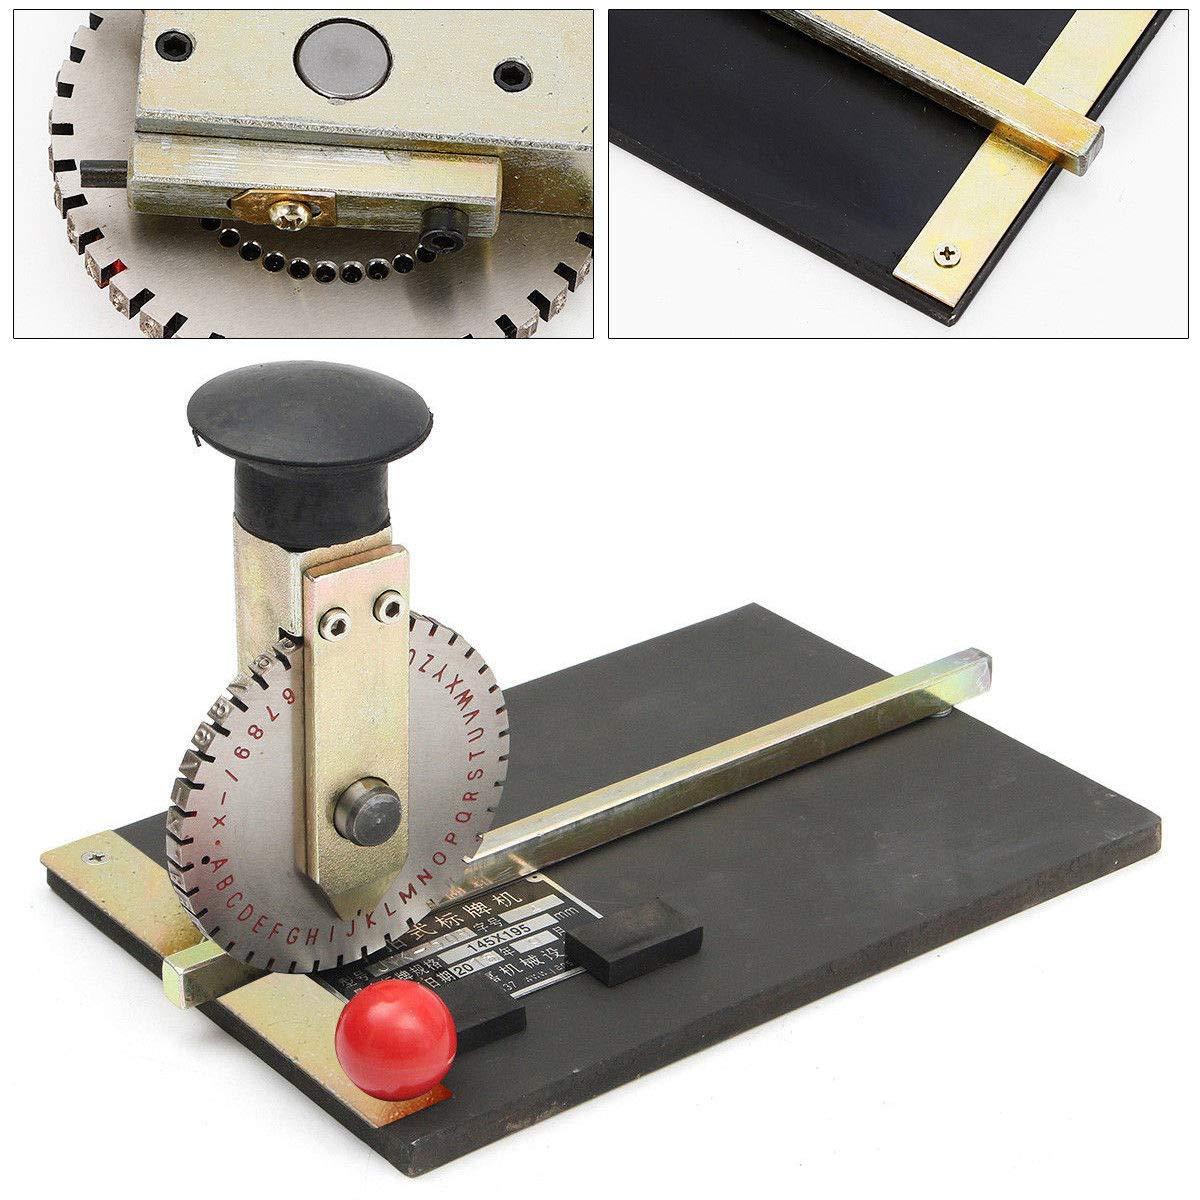 Manual Embossing Machine,Metal Embosser Alphanumeric Plate Stamping Dog Tag Embossing Marking Machine Printer with 2.0mm-5.0mm Print Wheel